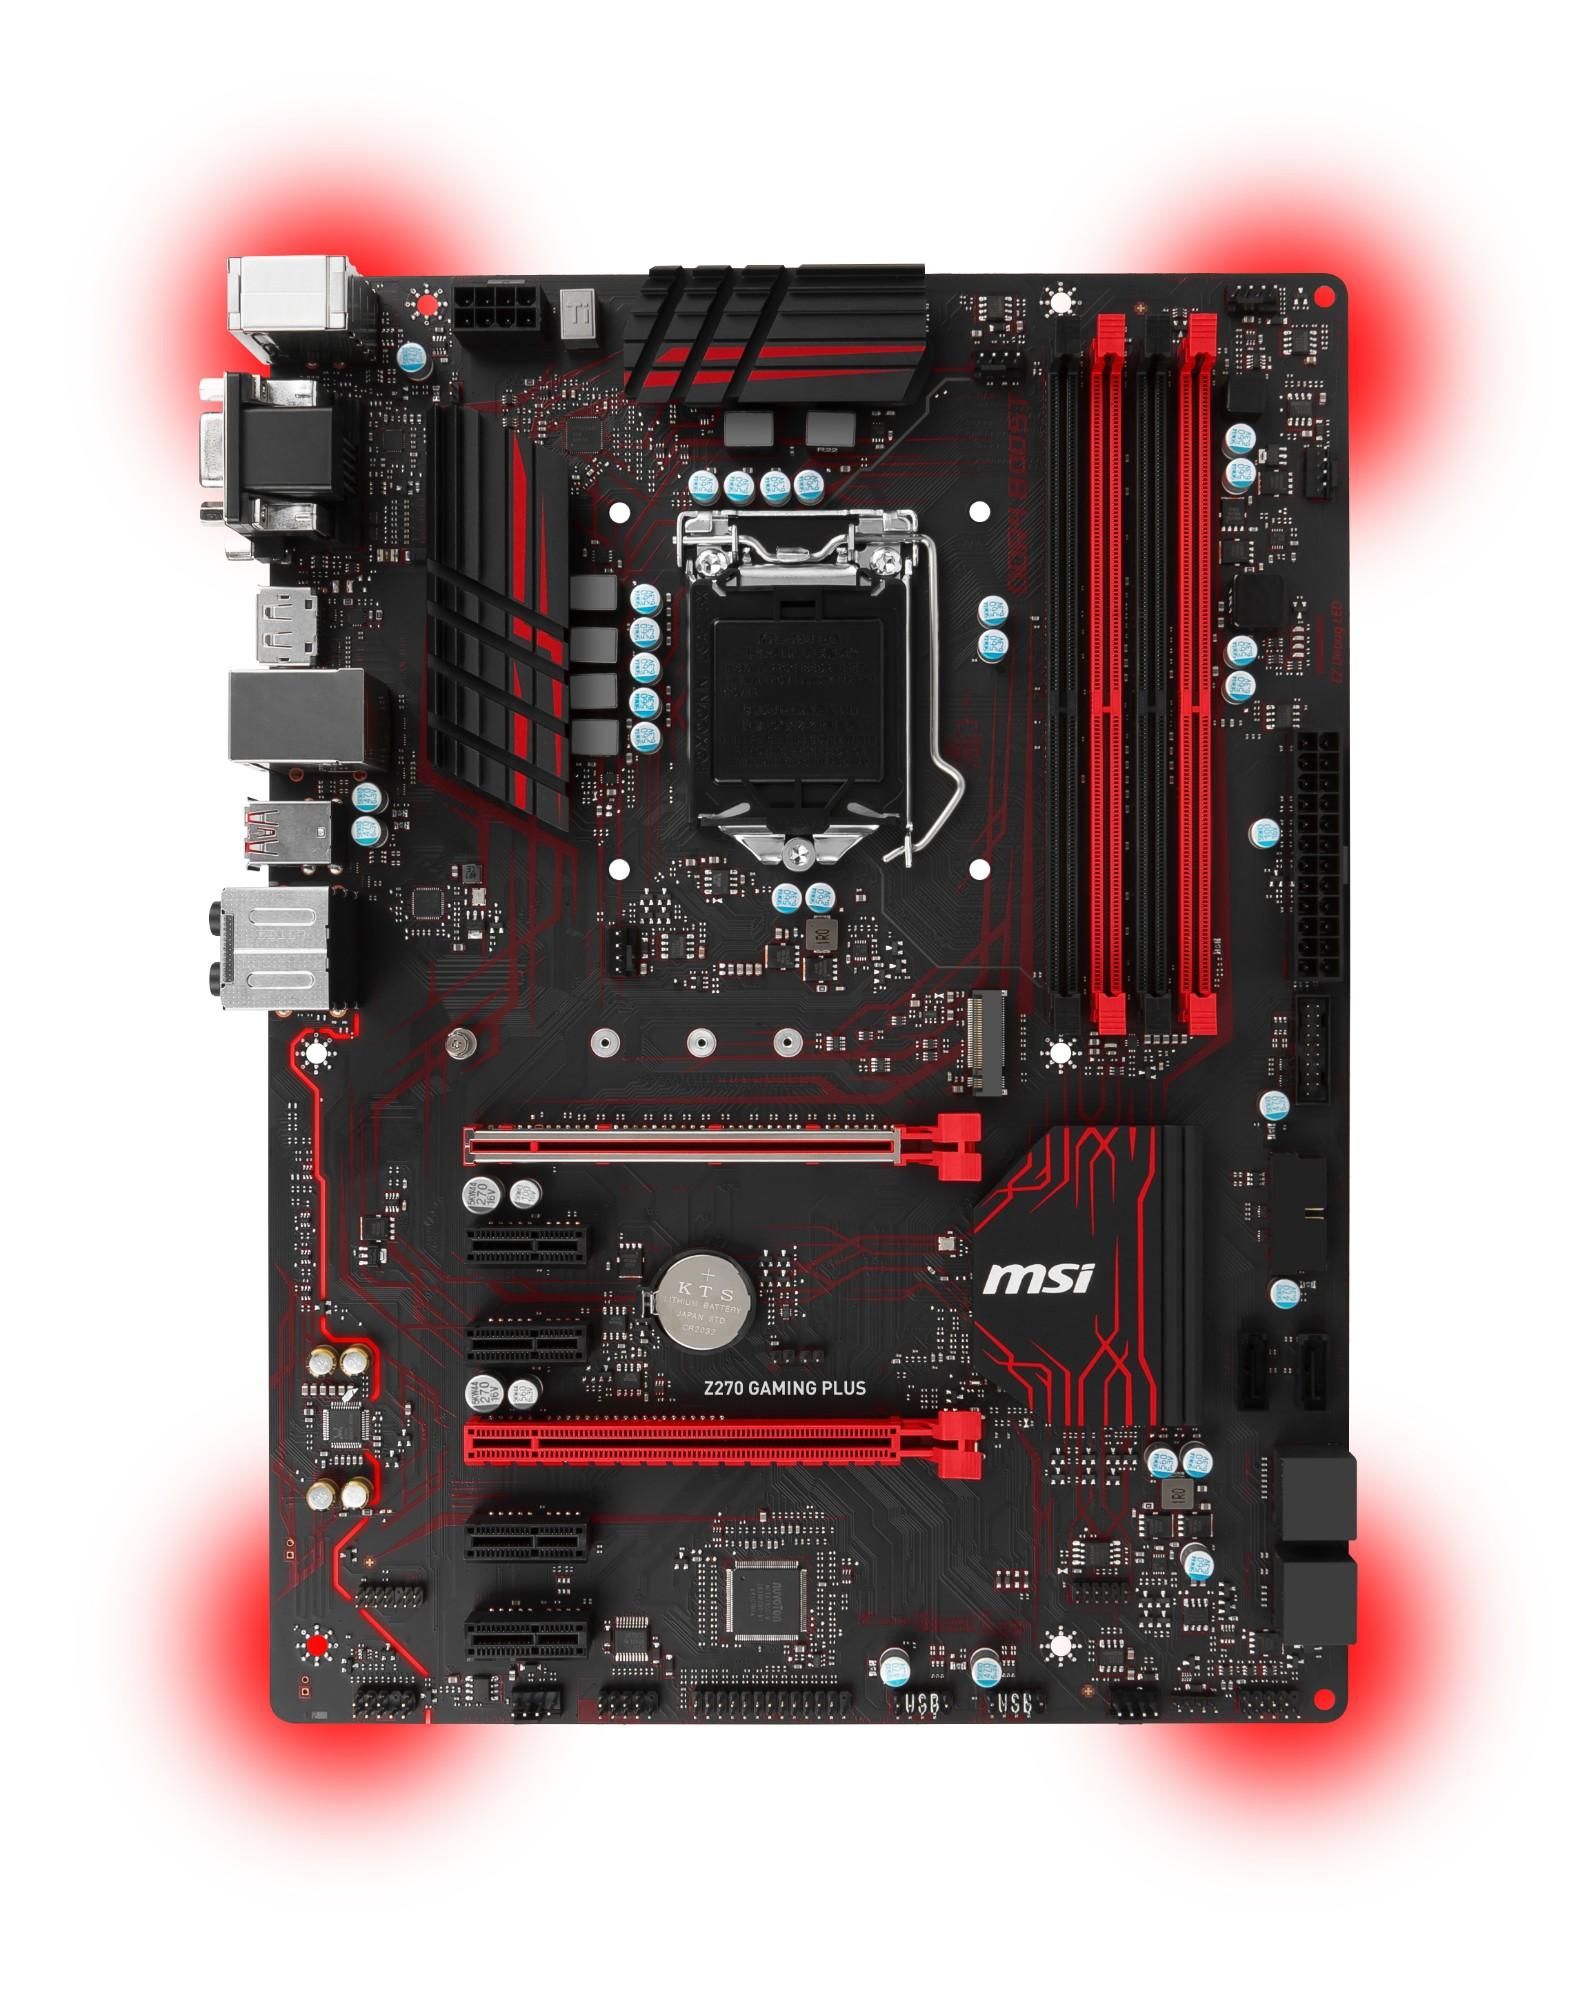 MSI Z270 GAMING PLUS Intel Z270 LGA1151 ATX motherboard